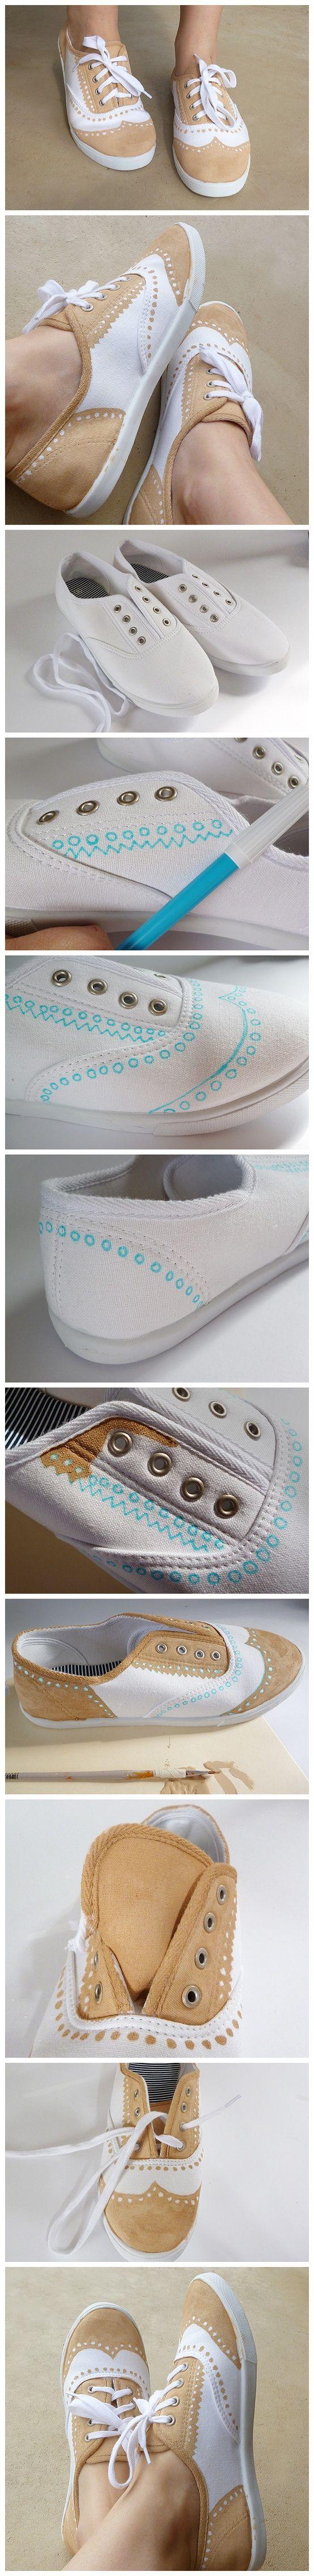 Shoe redesign